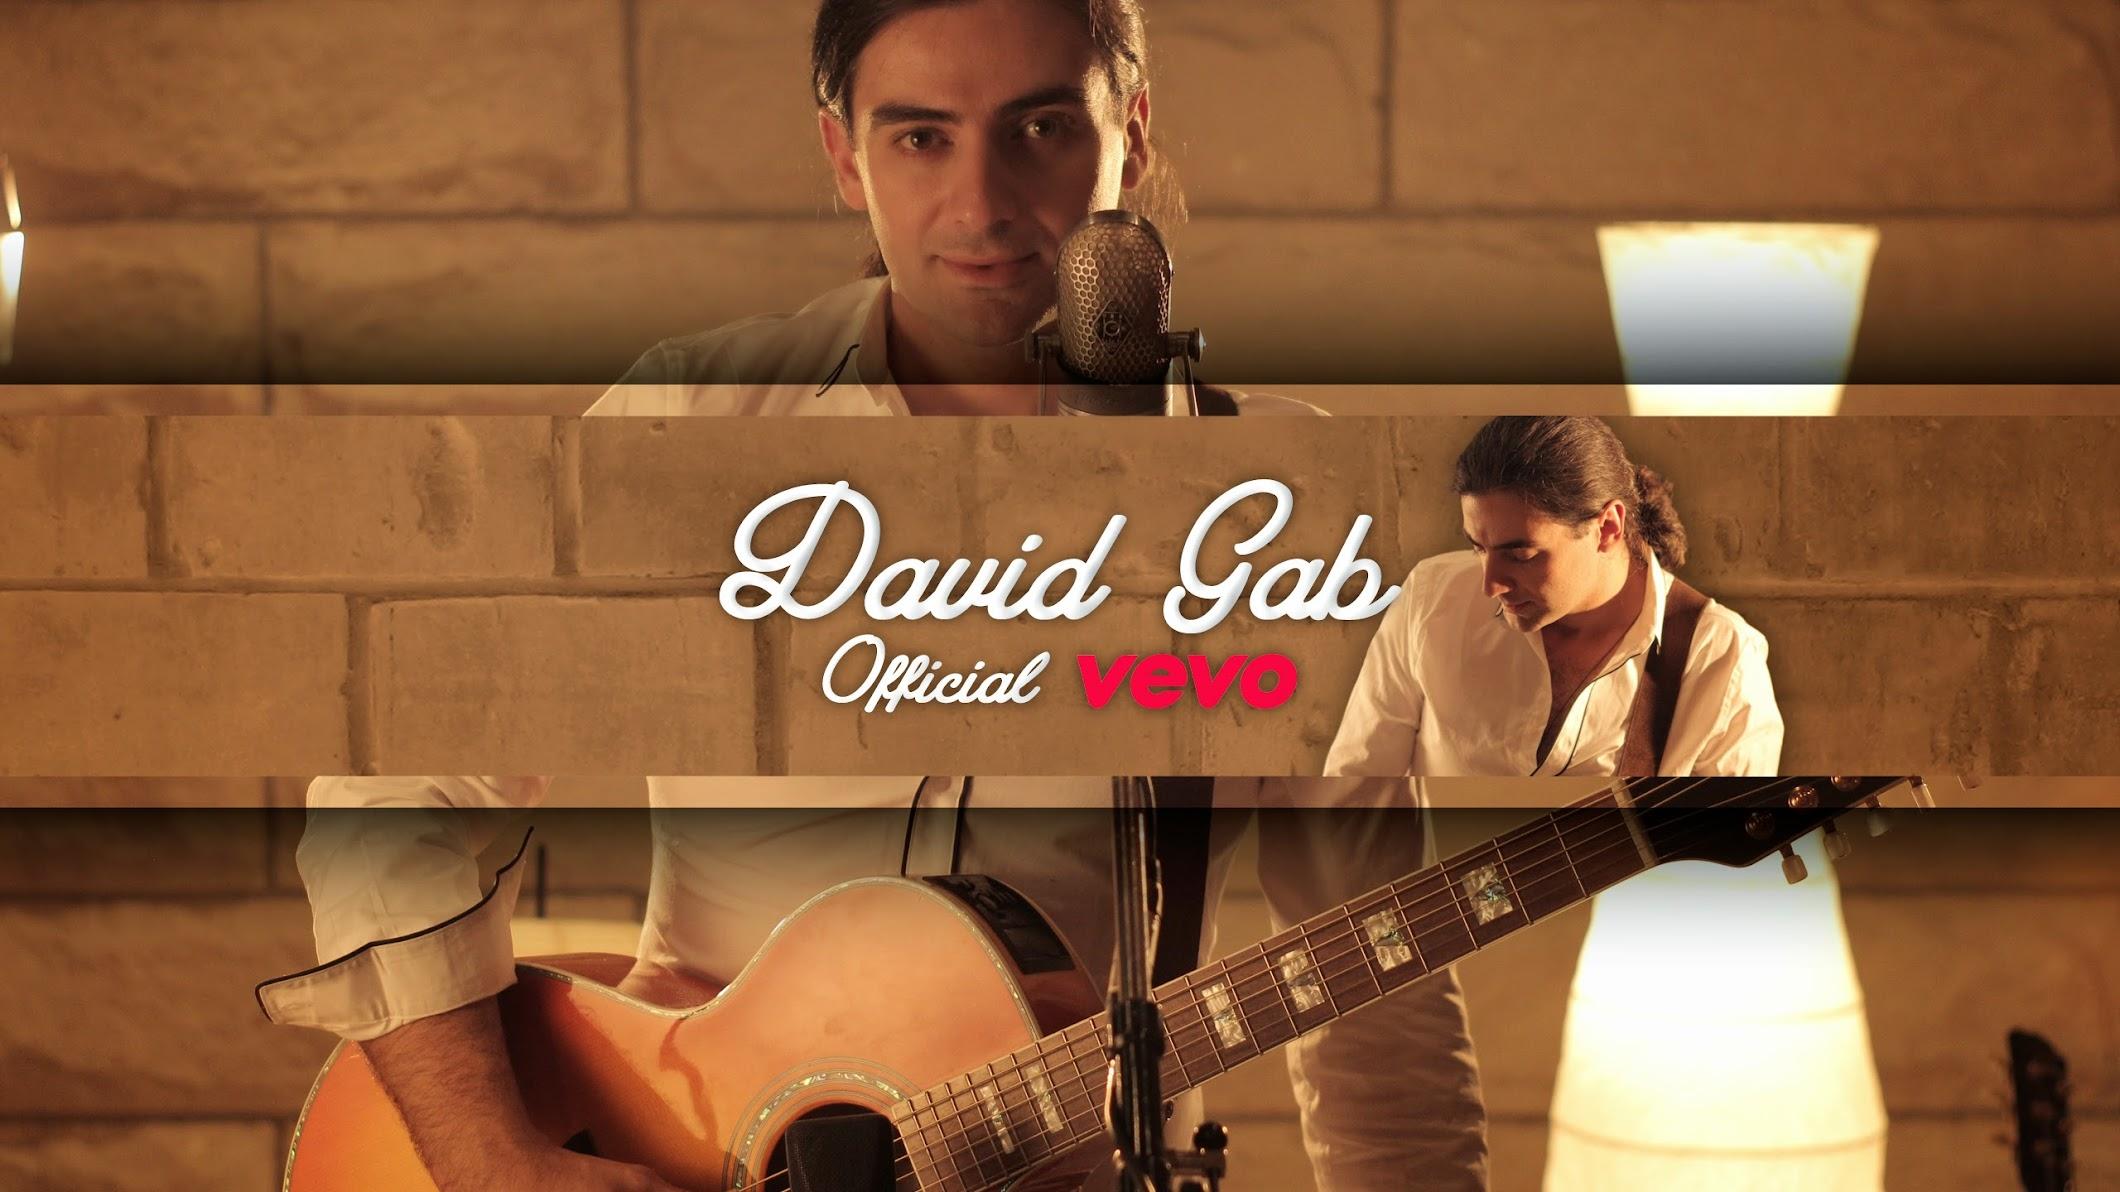 DavidGabVEVO